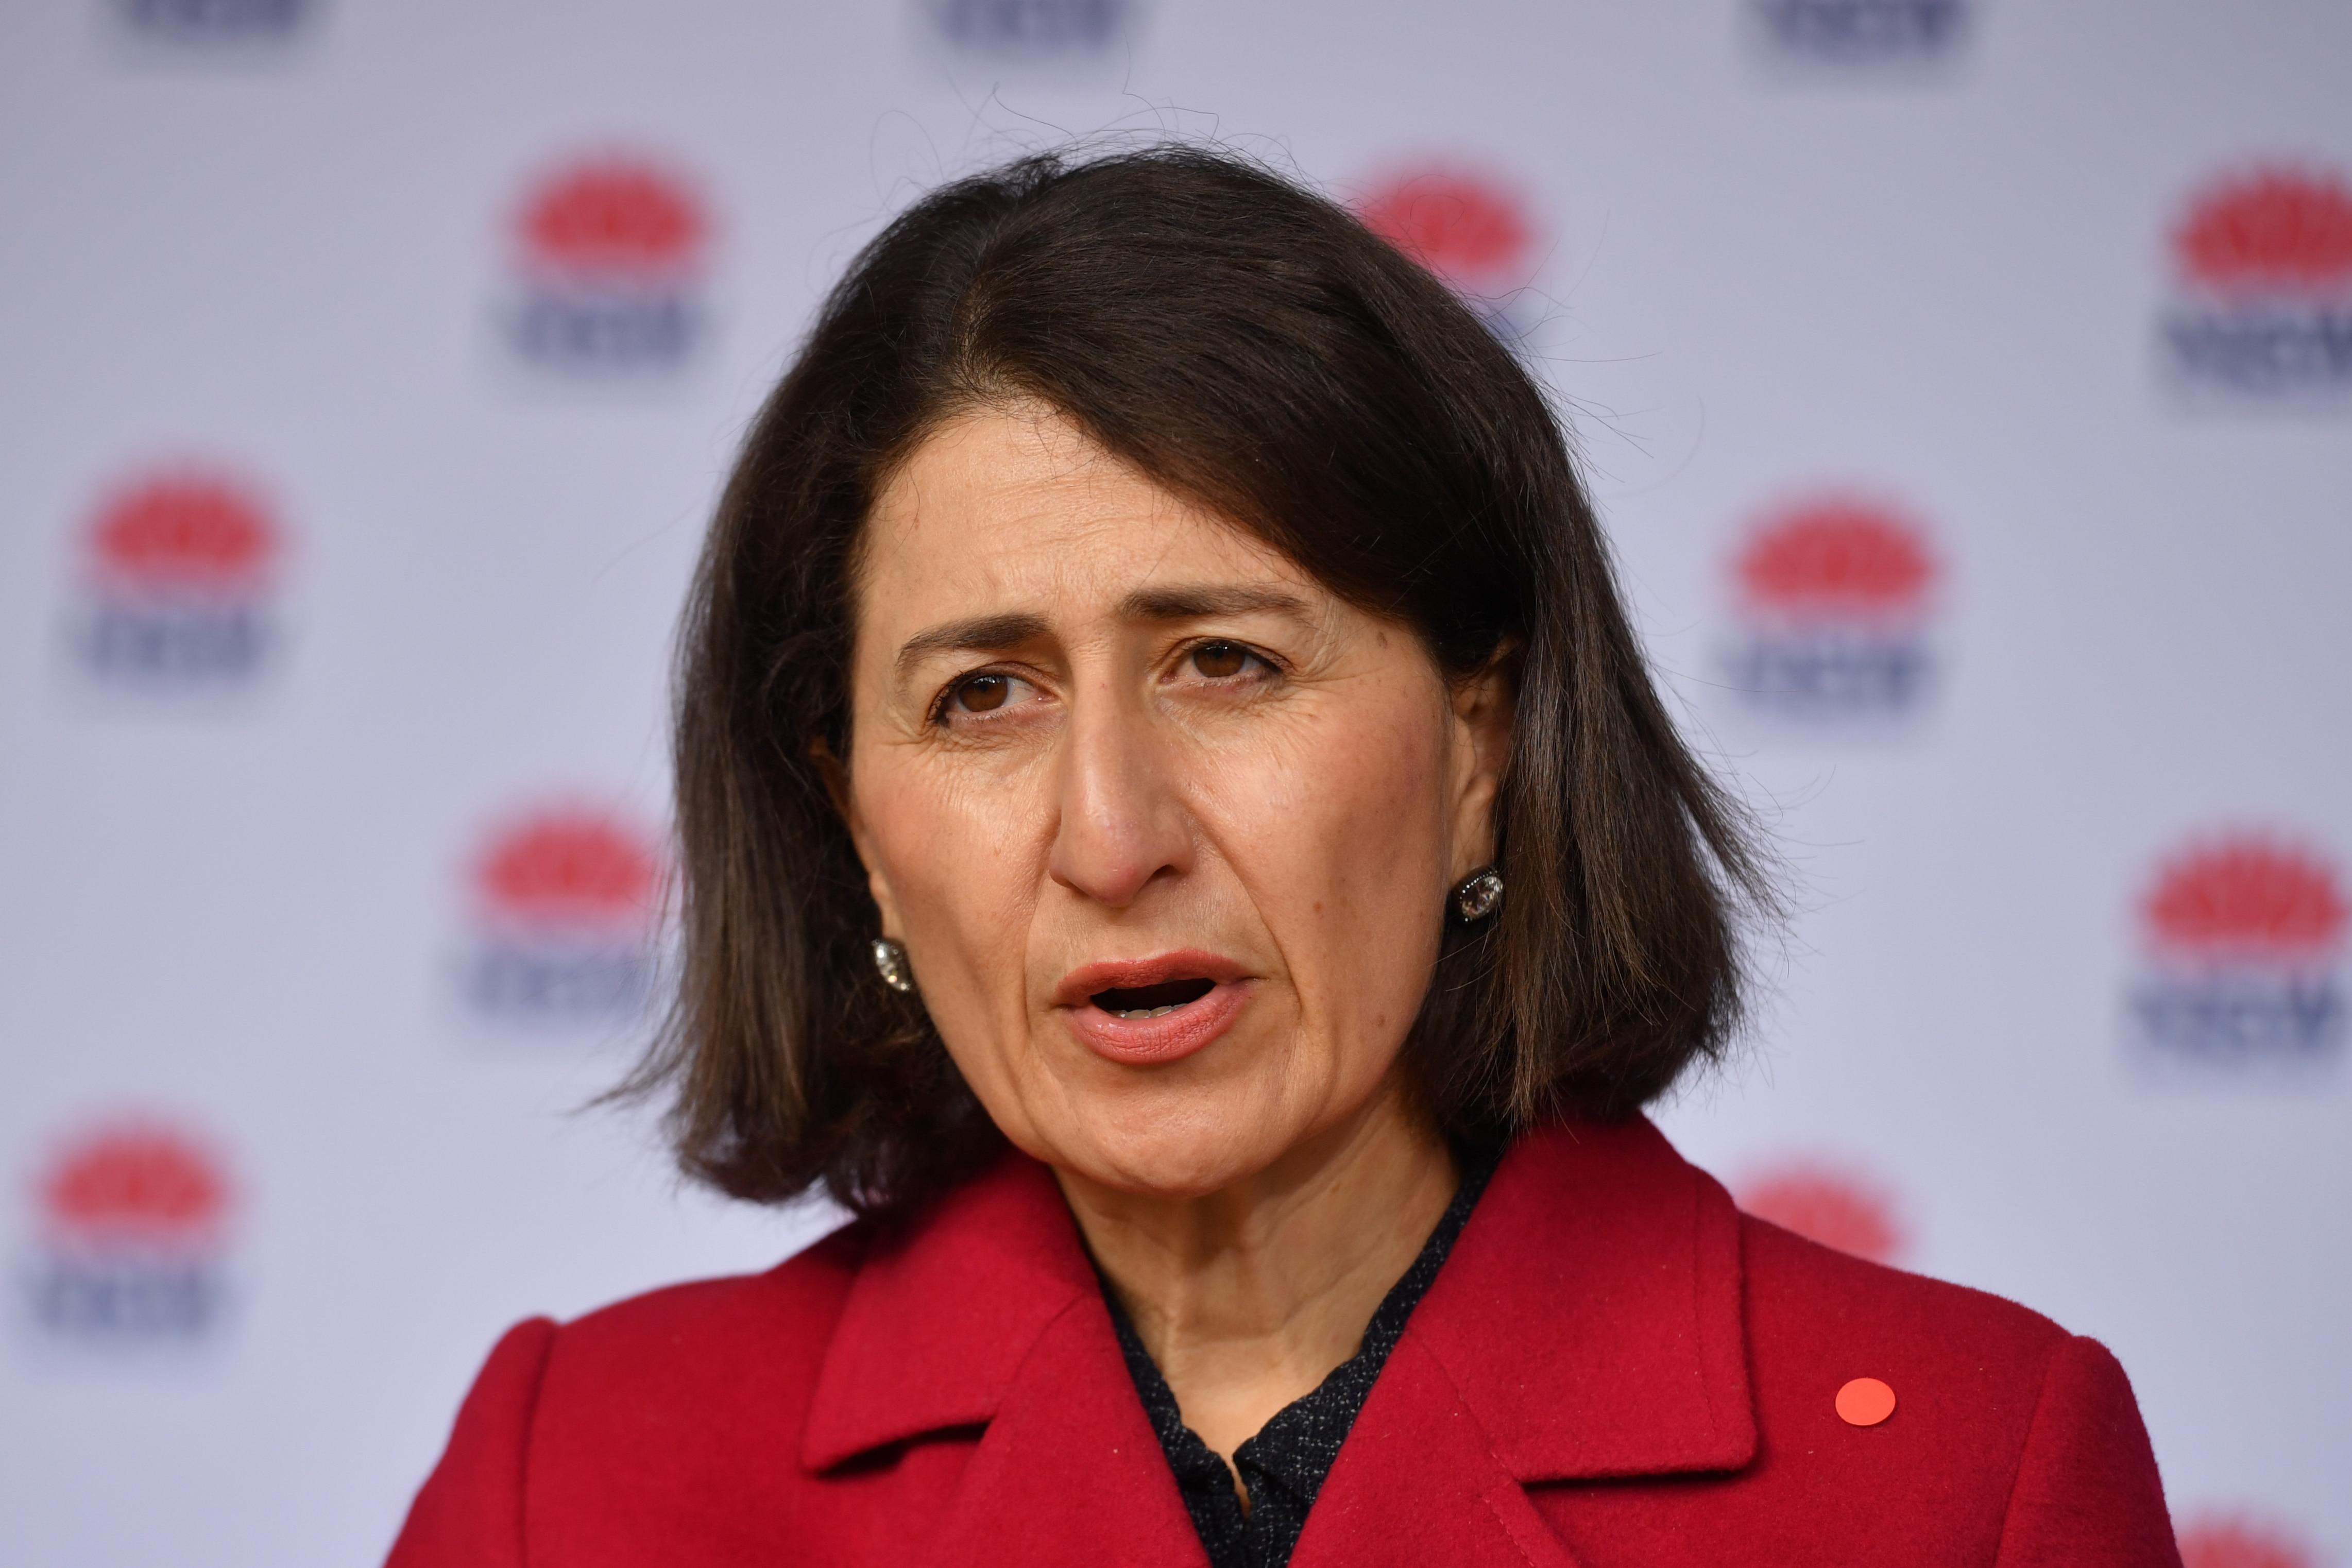 NSW Premier Gladys Berejiklian at a press conference.